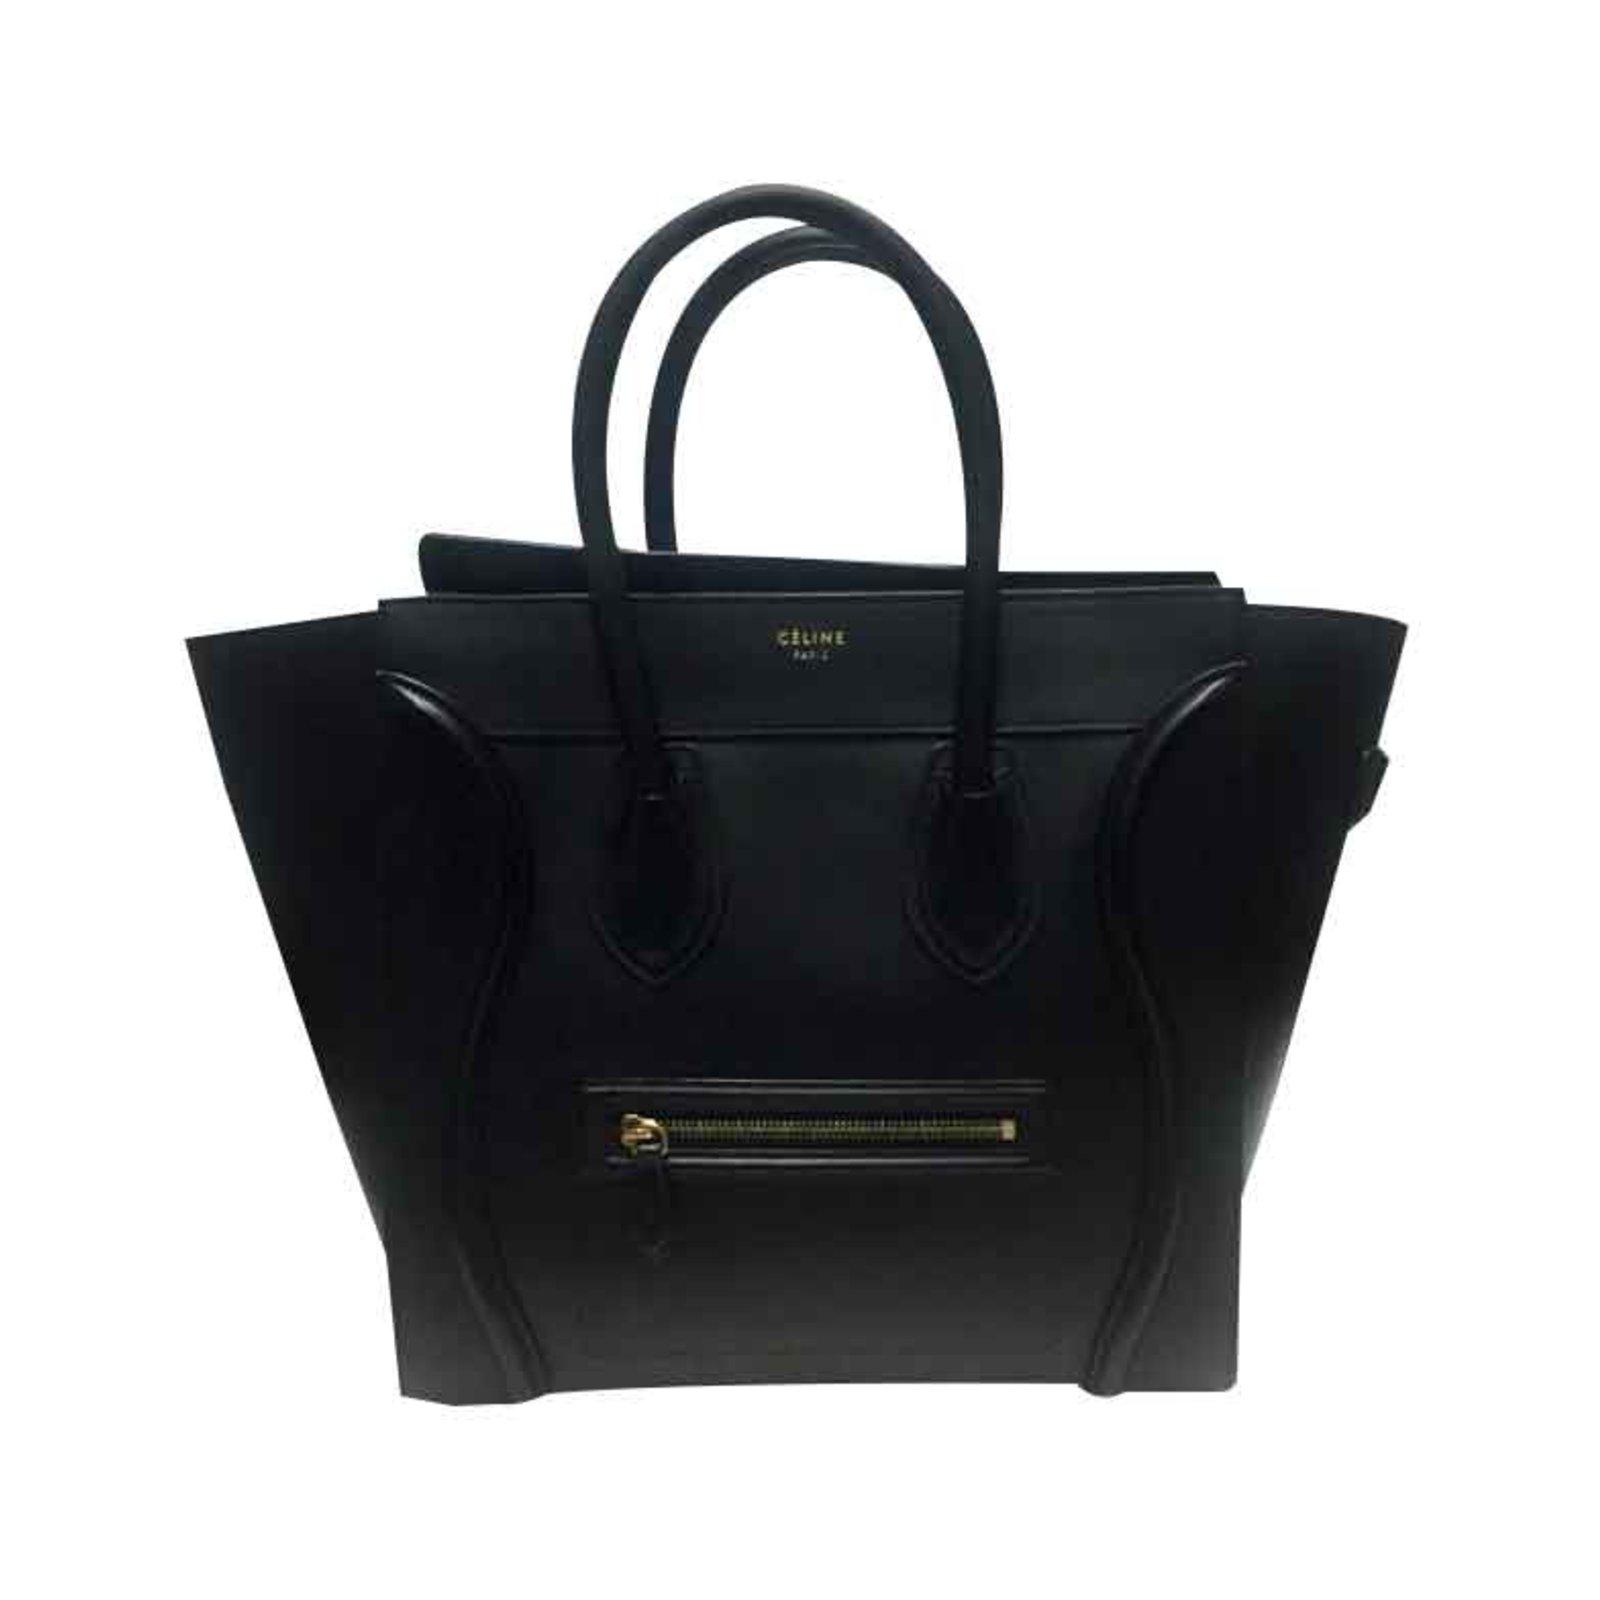 325b43a330 Céline CELINE MINI LUGGAGE SAC BREND NEW BLACK Handbags Leather Black ref .101298